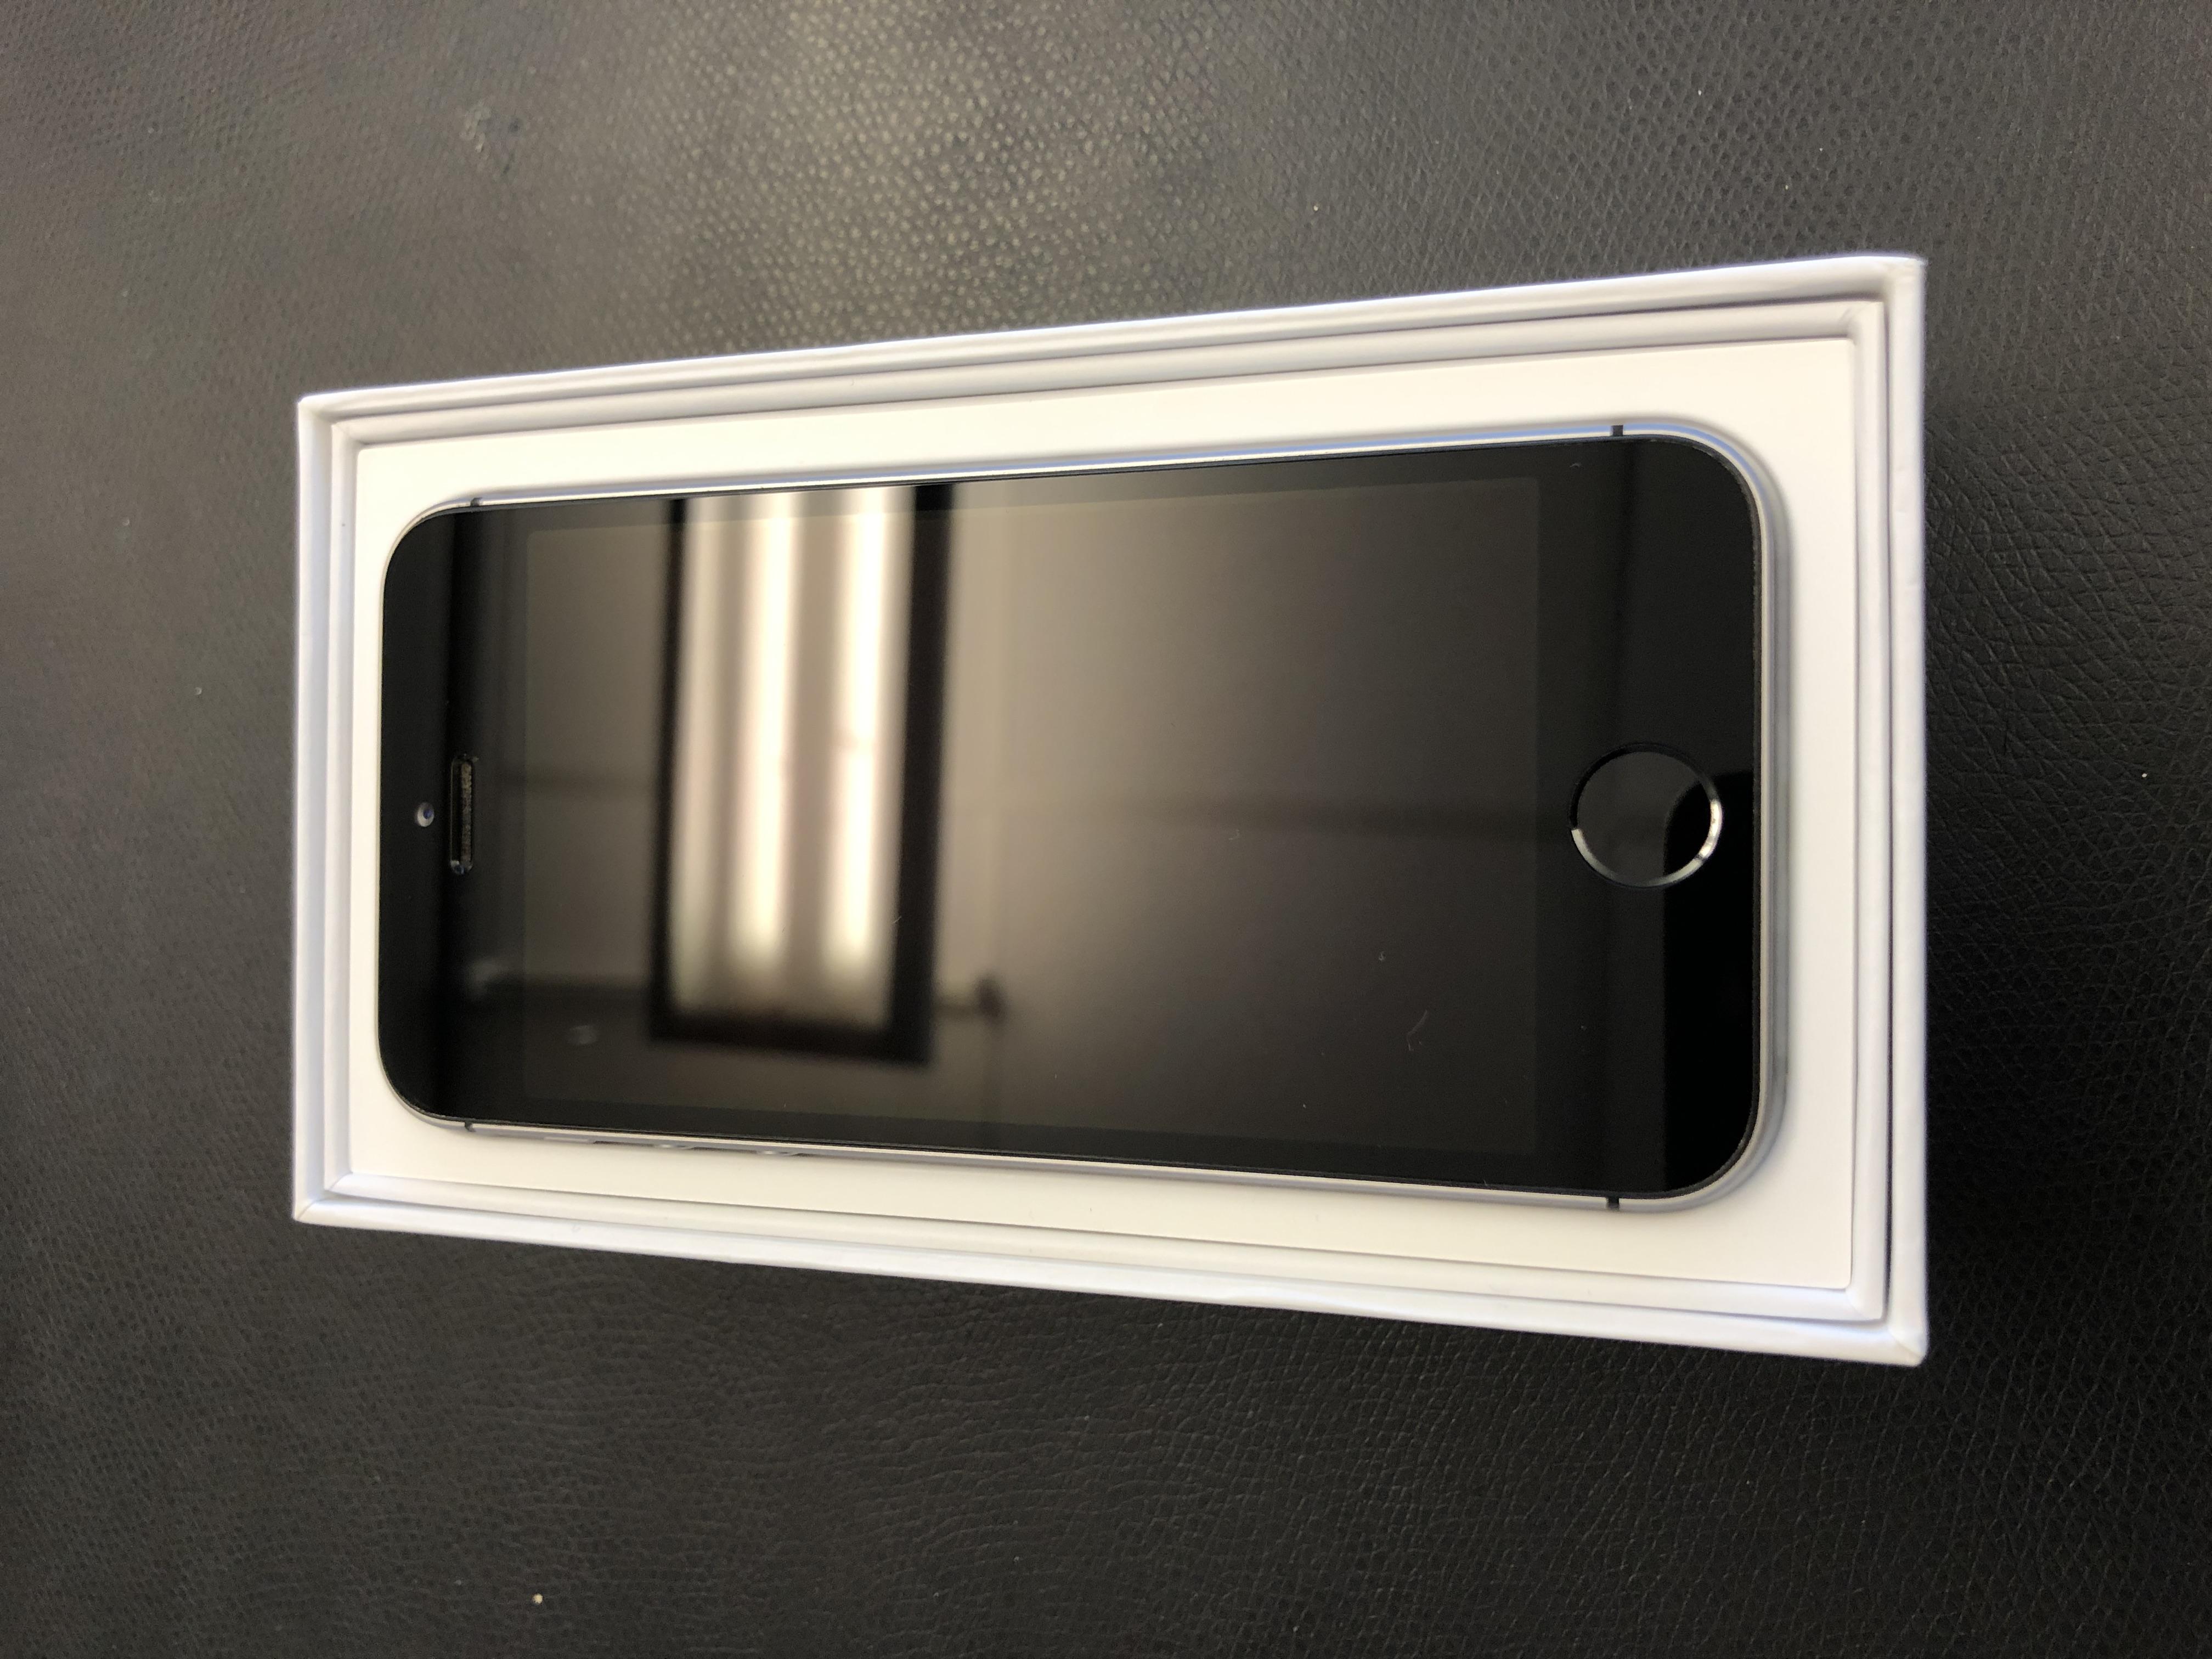 iPhone SE 64GB, 64GB, Gray, Afbeelding 1